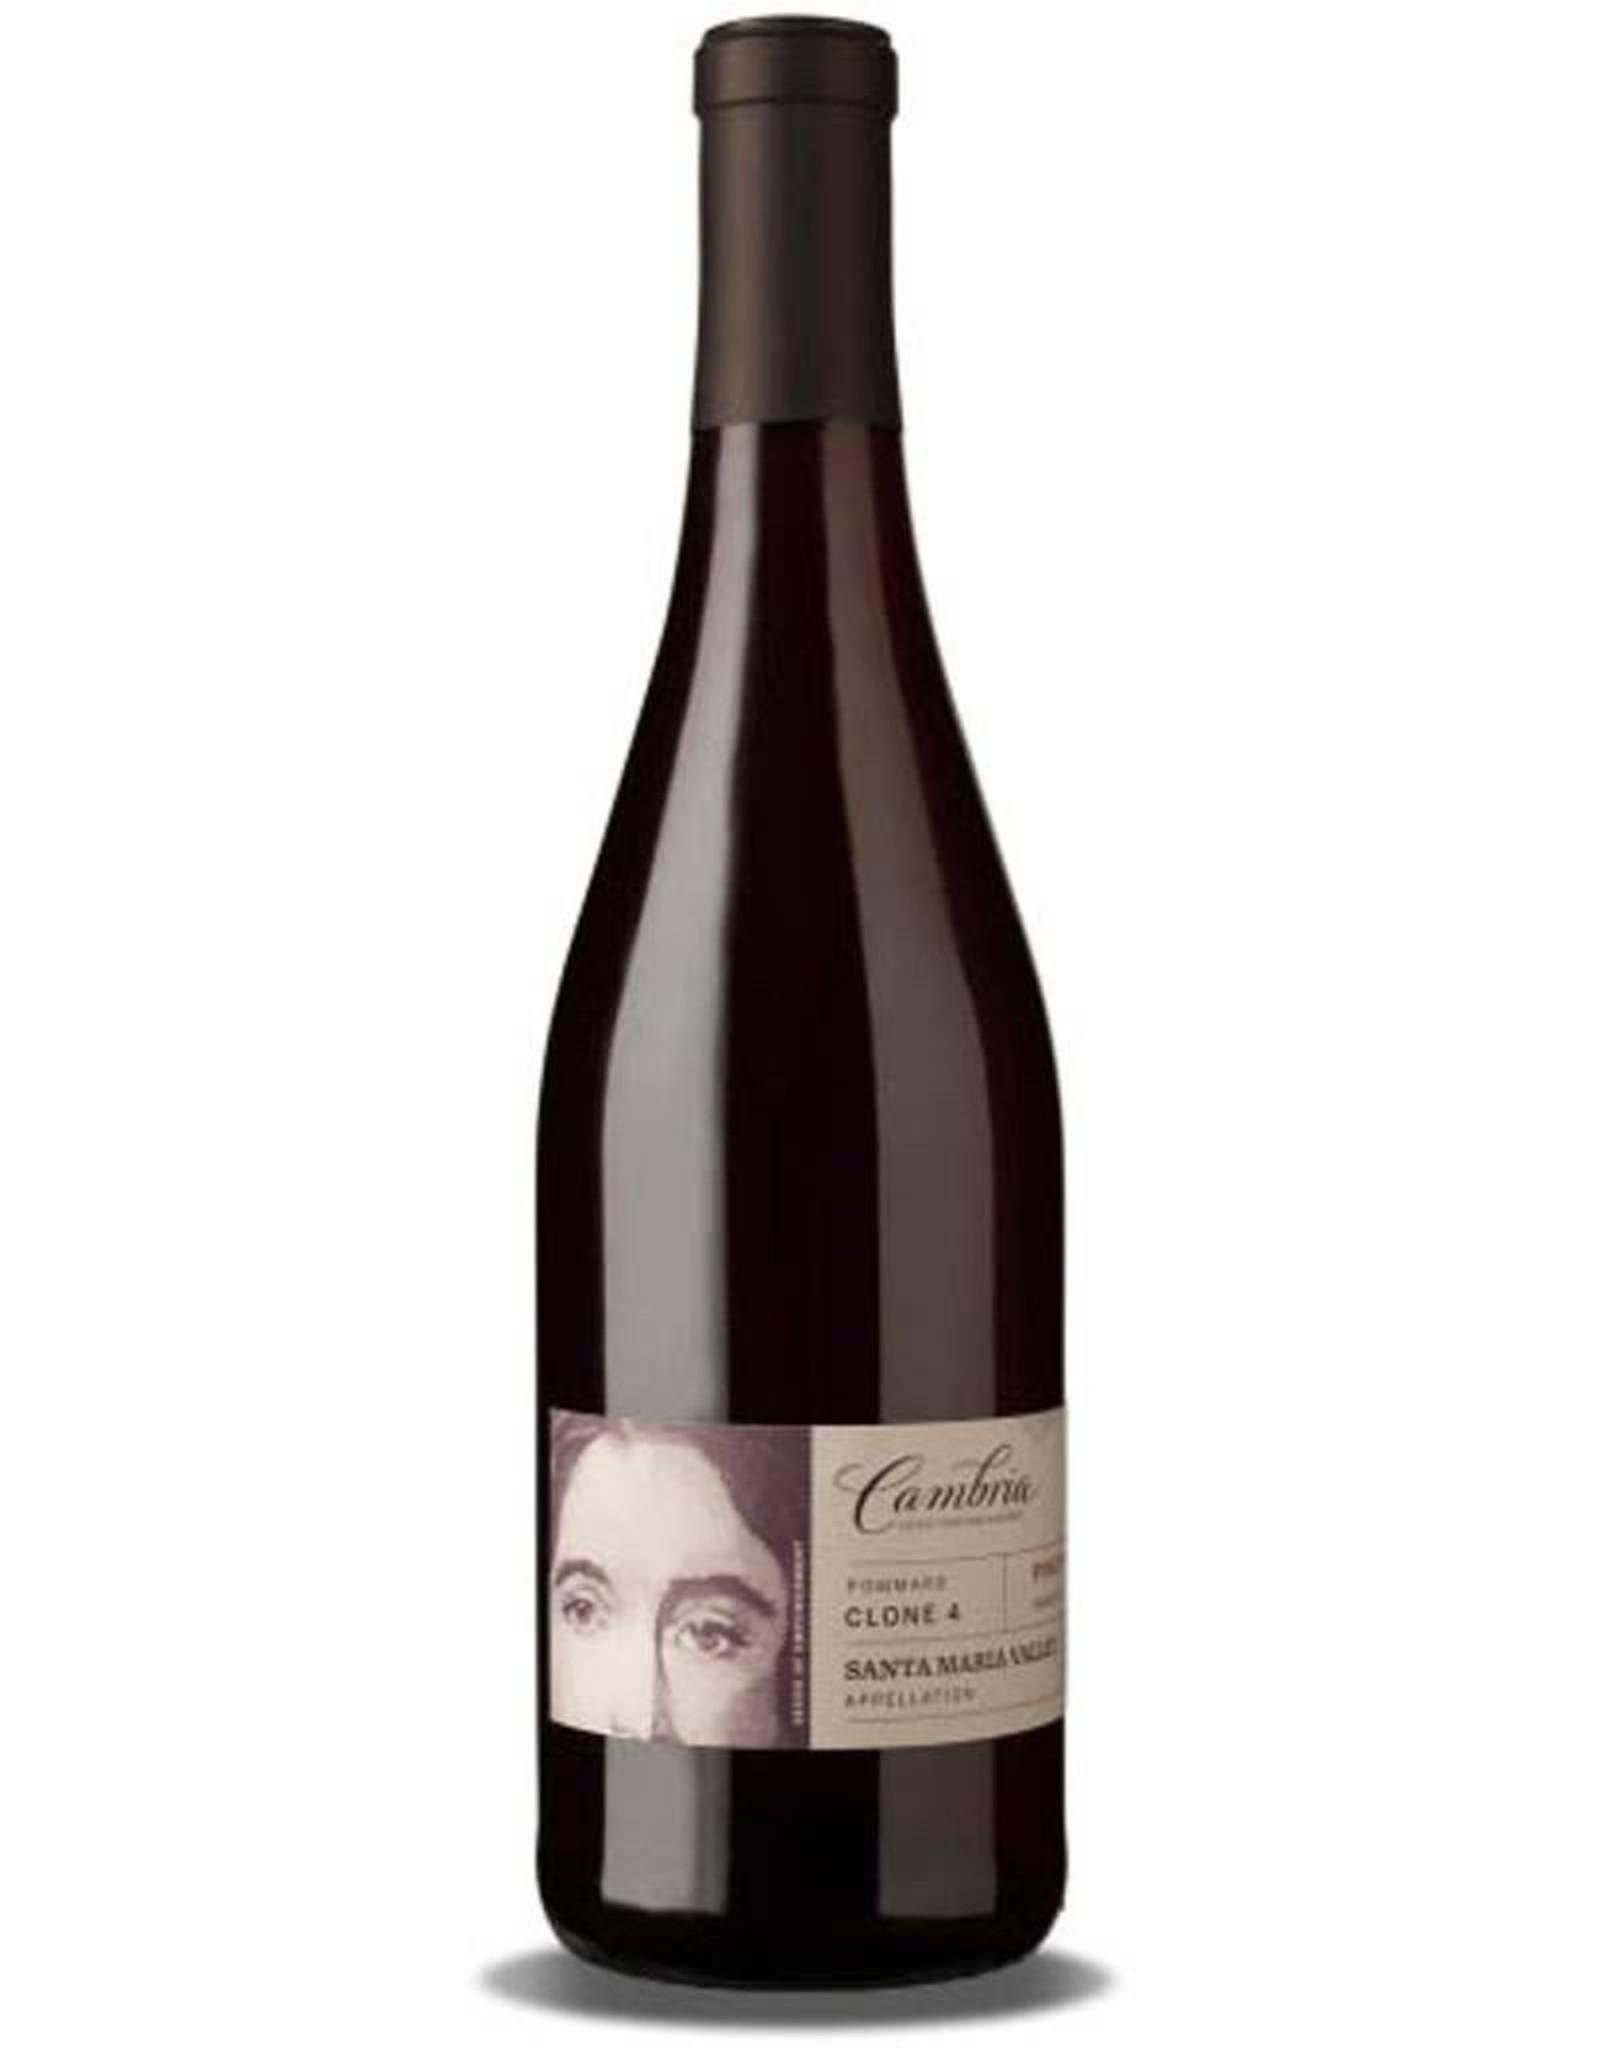 Red Wine 2014, Cambria Pommard Clone 4, Pinot Noir, Santa Maria Valley, Santa Barbara, California, 14.2% Alc, CT